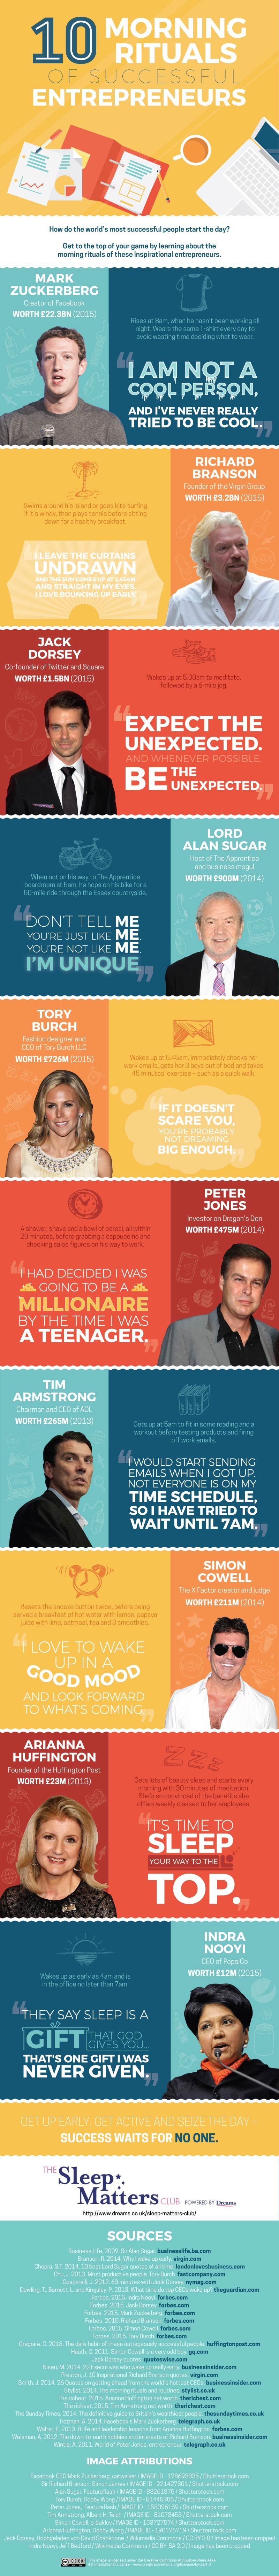 Ten Morning rituals of successful Entrepreneurs #Infographic